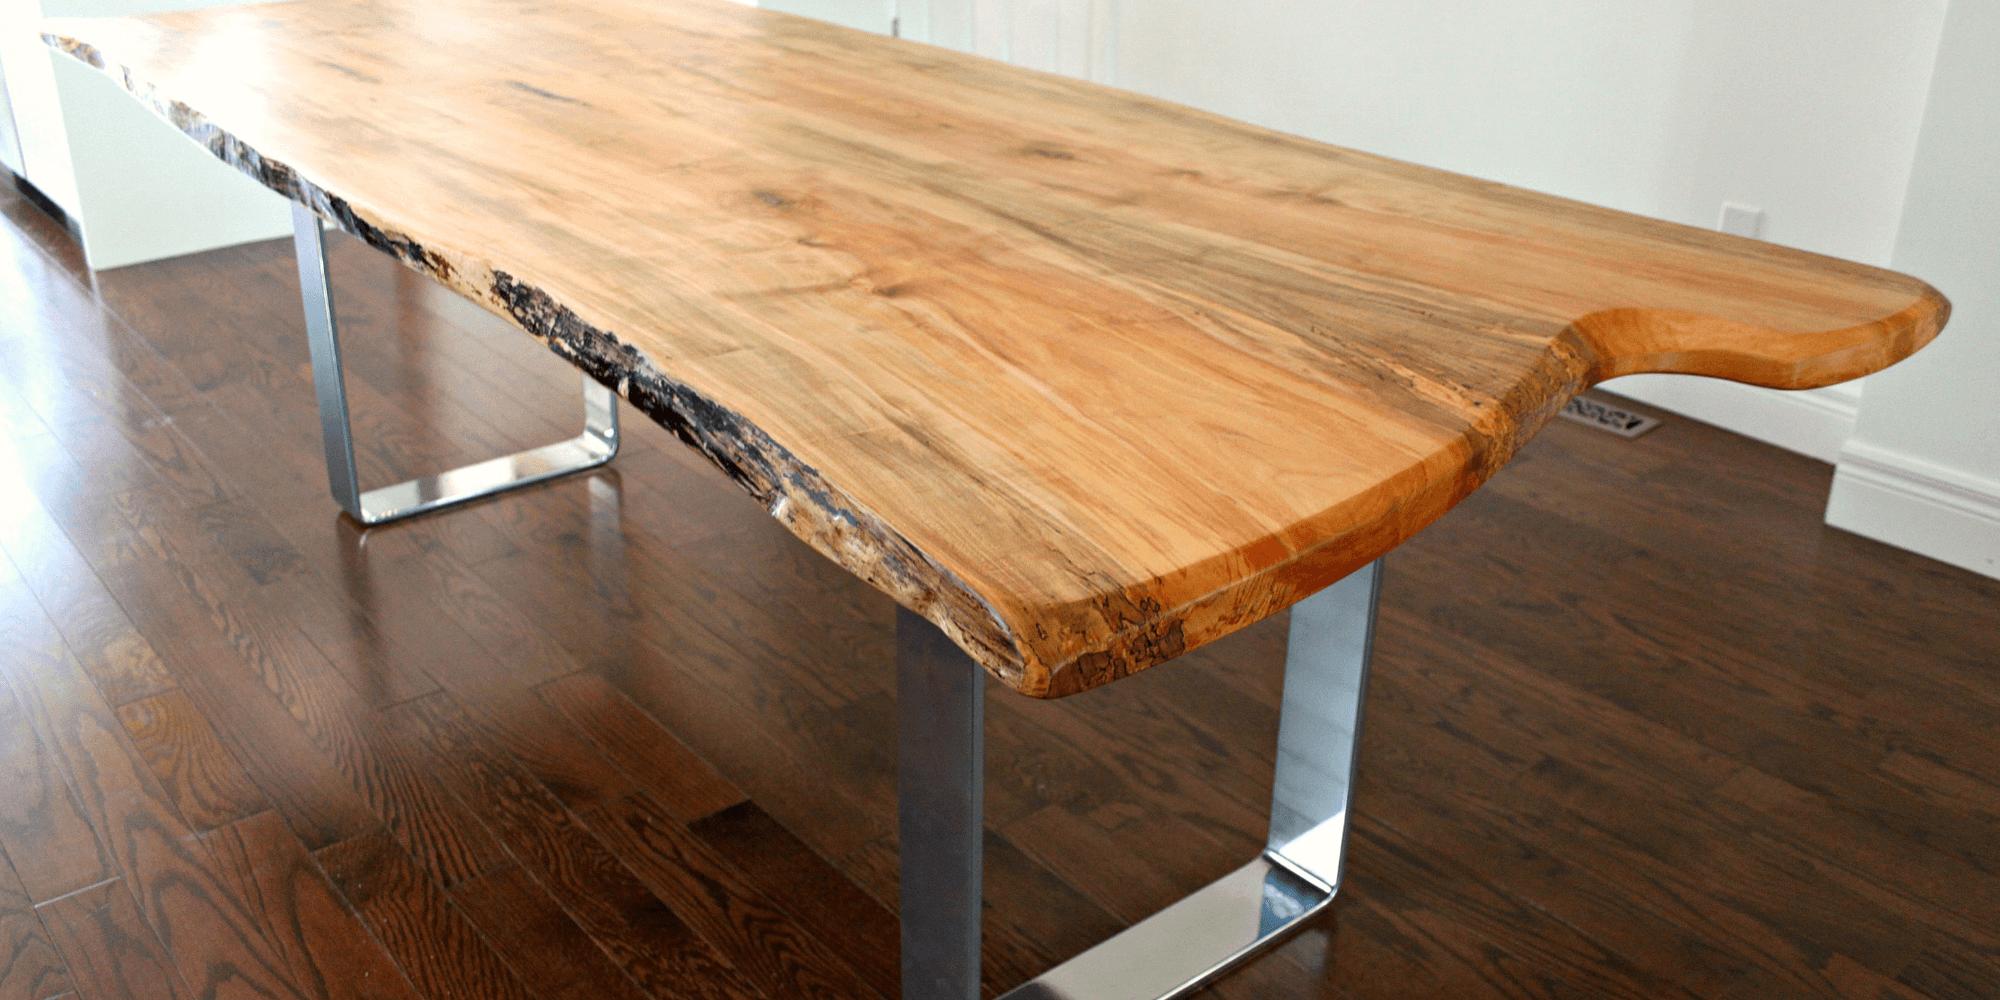 Living Wood Design Toronto Muskoka